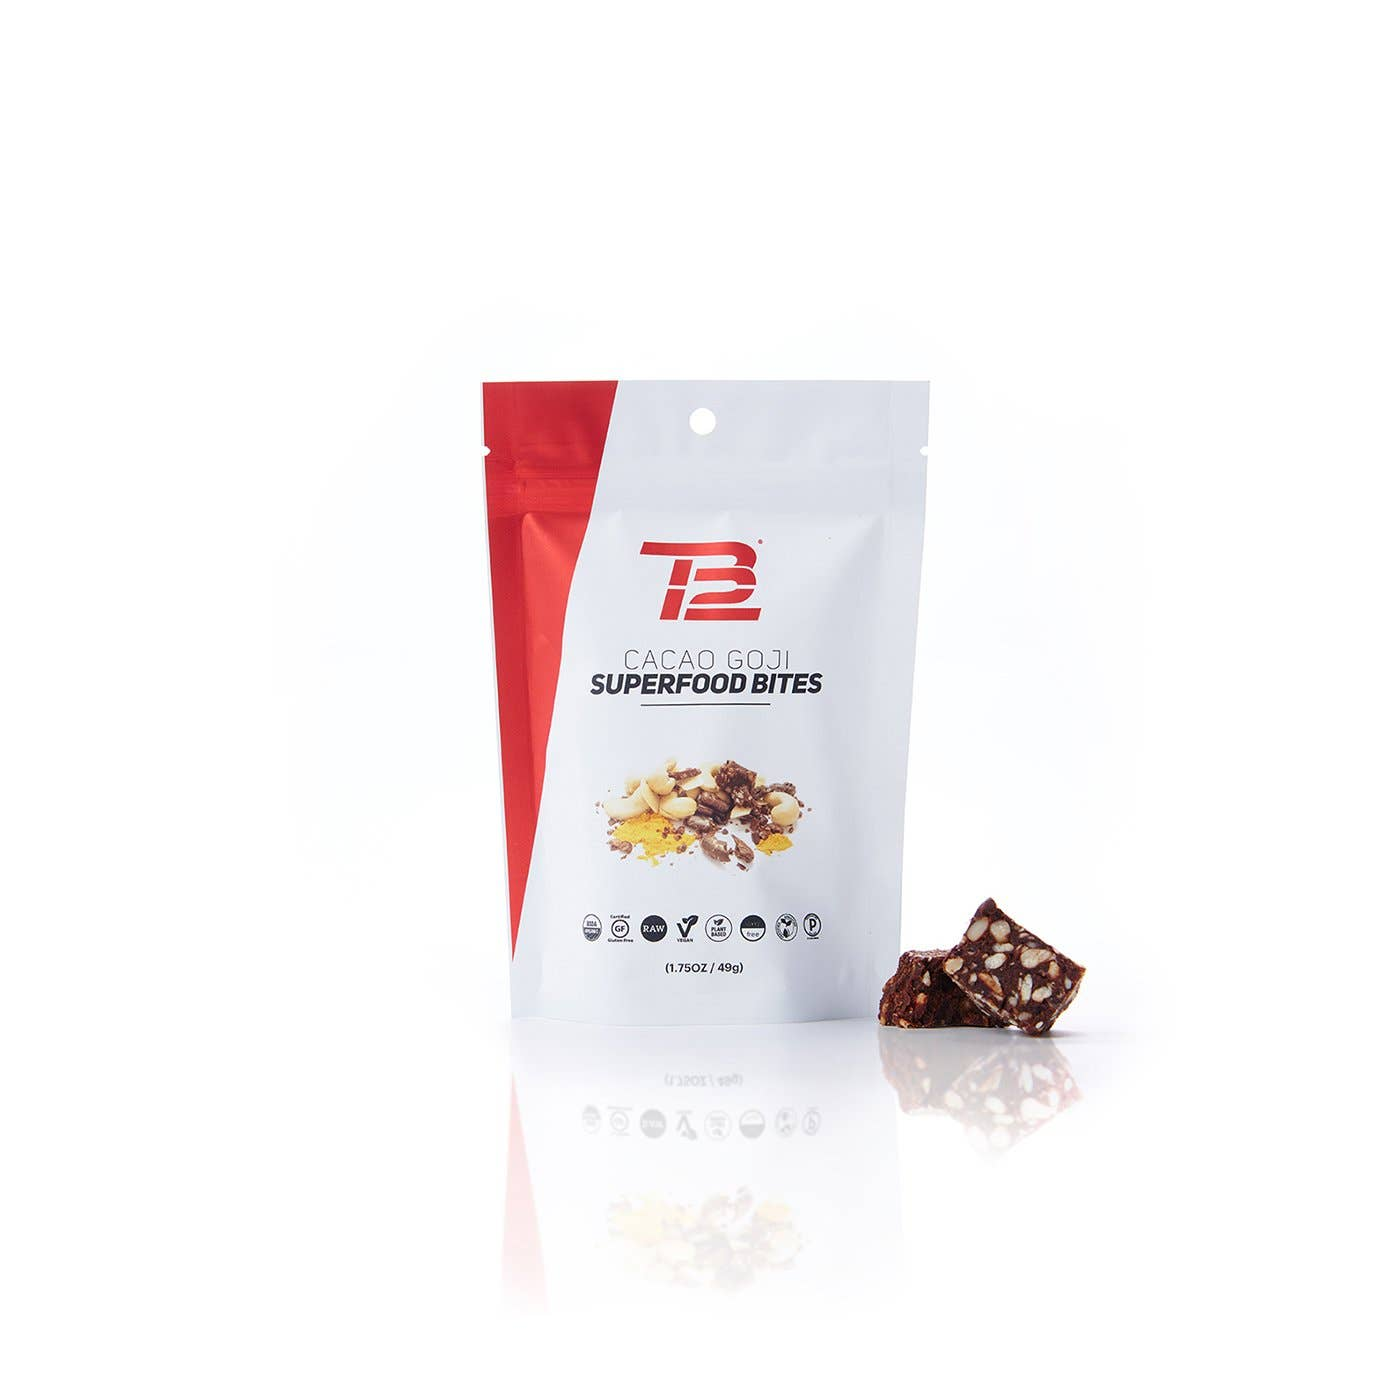 TB12™ Cacao Goji Superfood Bites